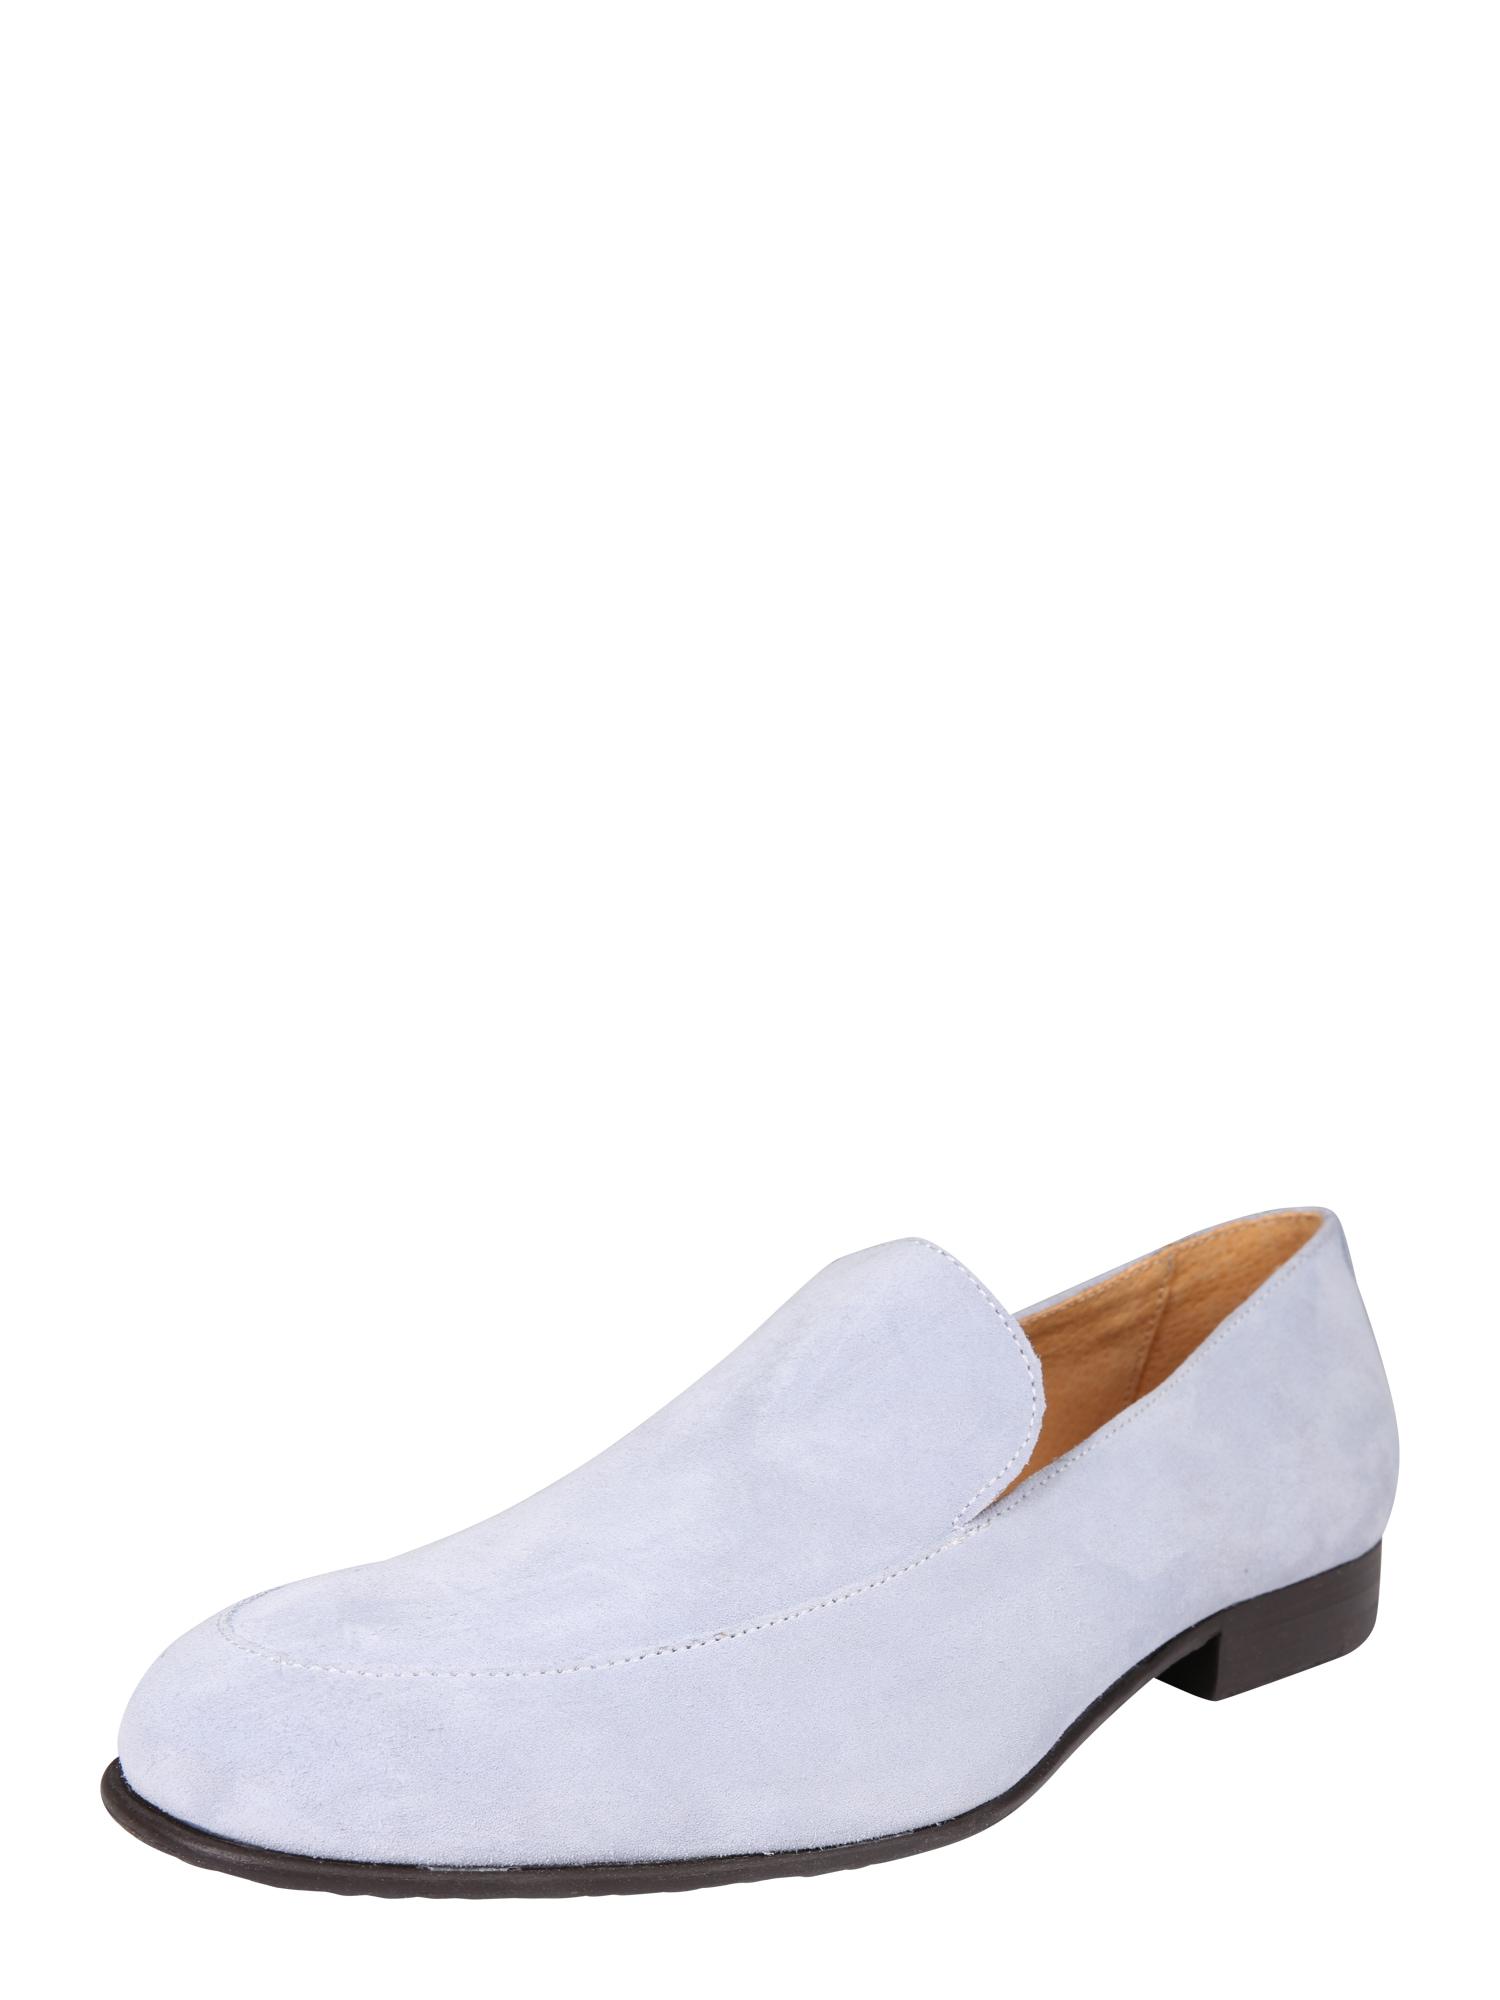 Slipper Loafers azurová Zign